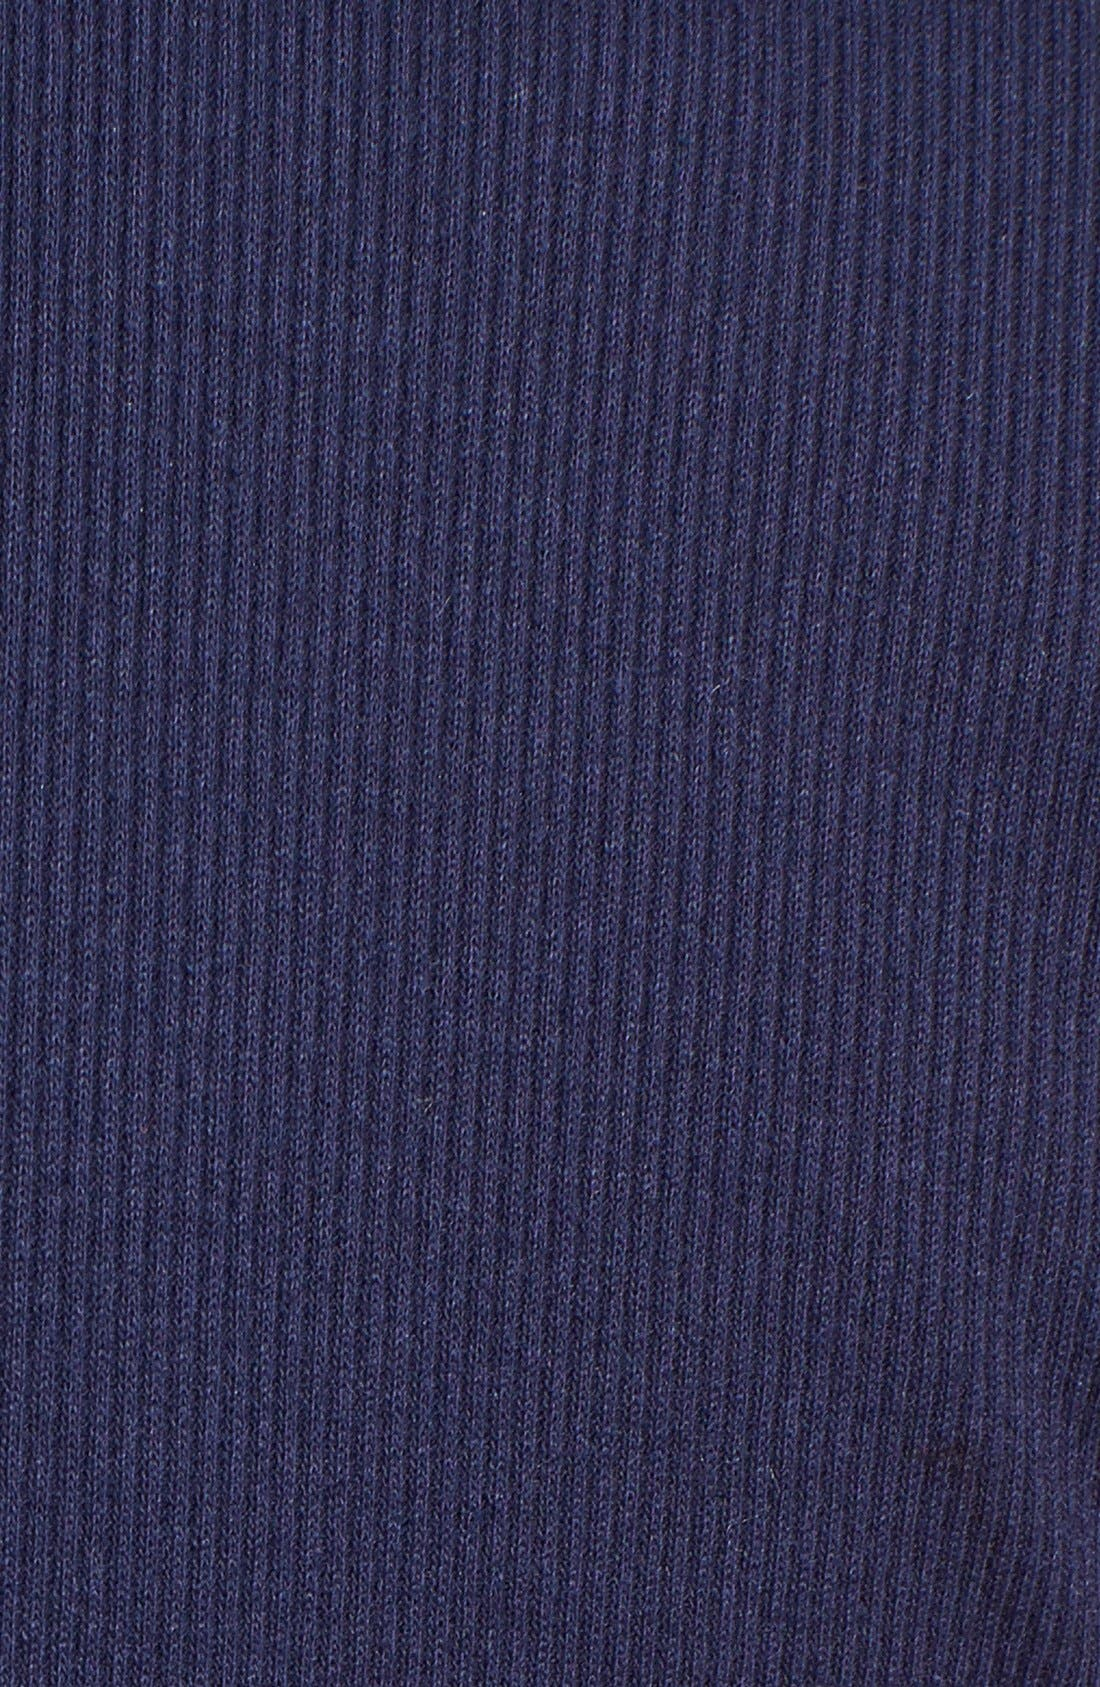 'Amber' Scoop Neck Maxi Dress,                             Alternate thumbnail 2, color,                             410